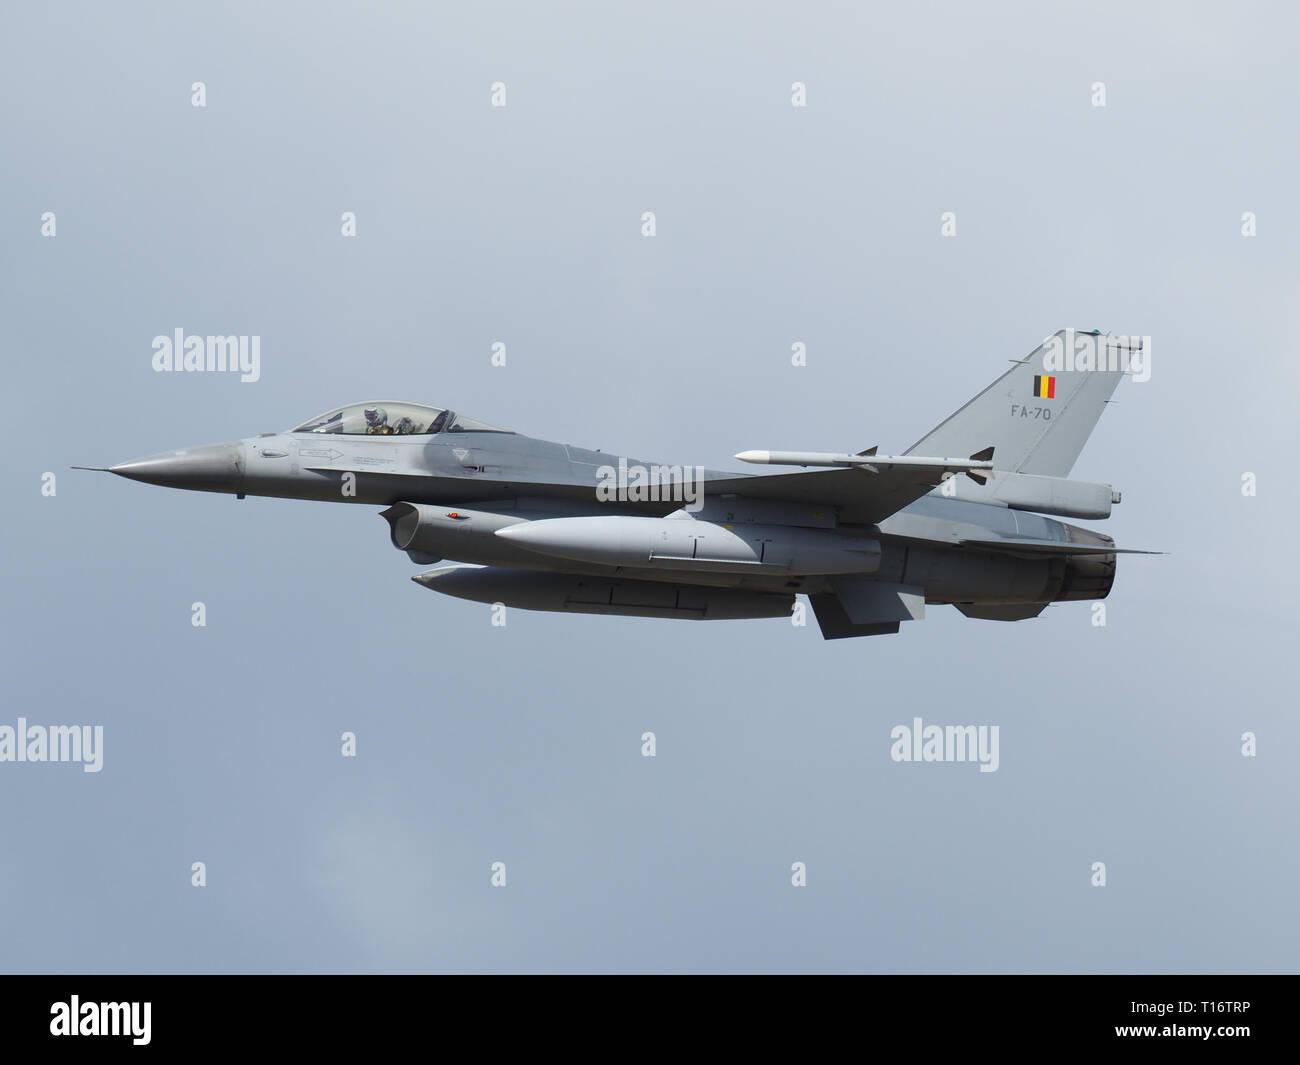 Kleine-Brogel, Bélgica - 8 de septiembre de 2018: F-16 de la Fuerza Aérea Belga durante un festival aéreo. Foto de stock